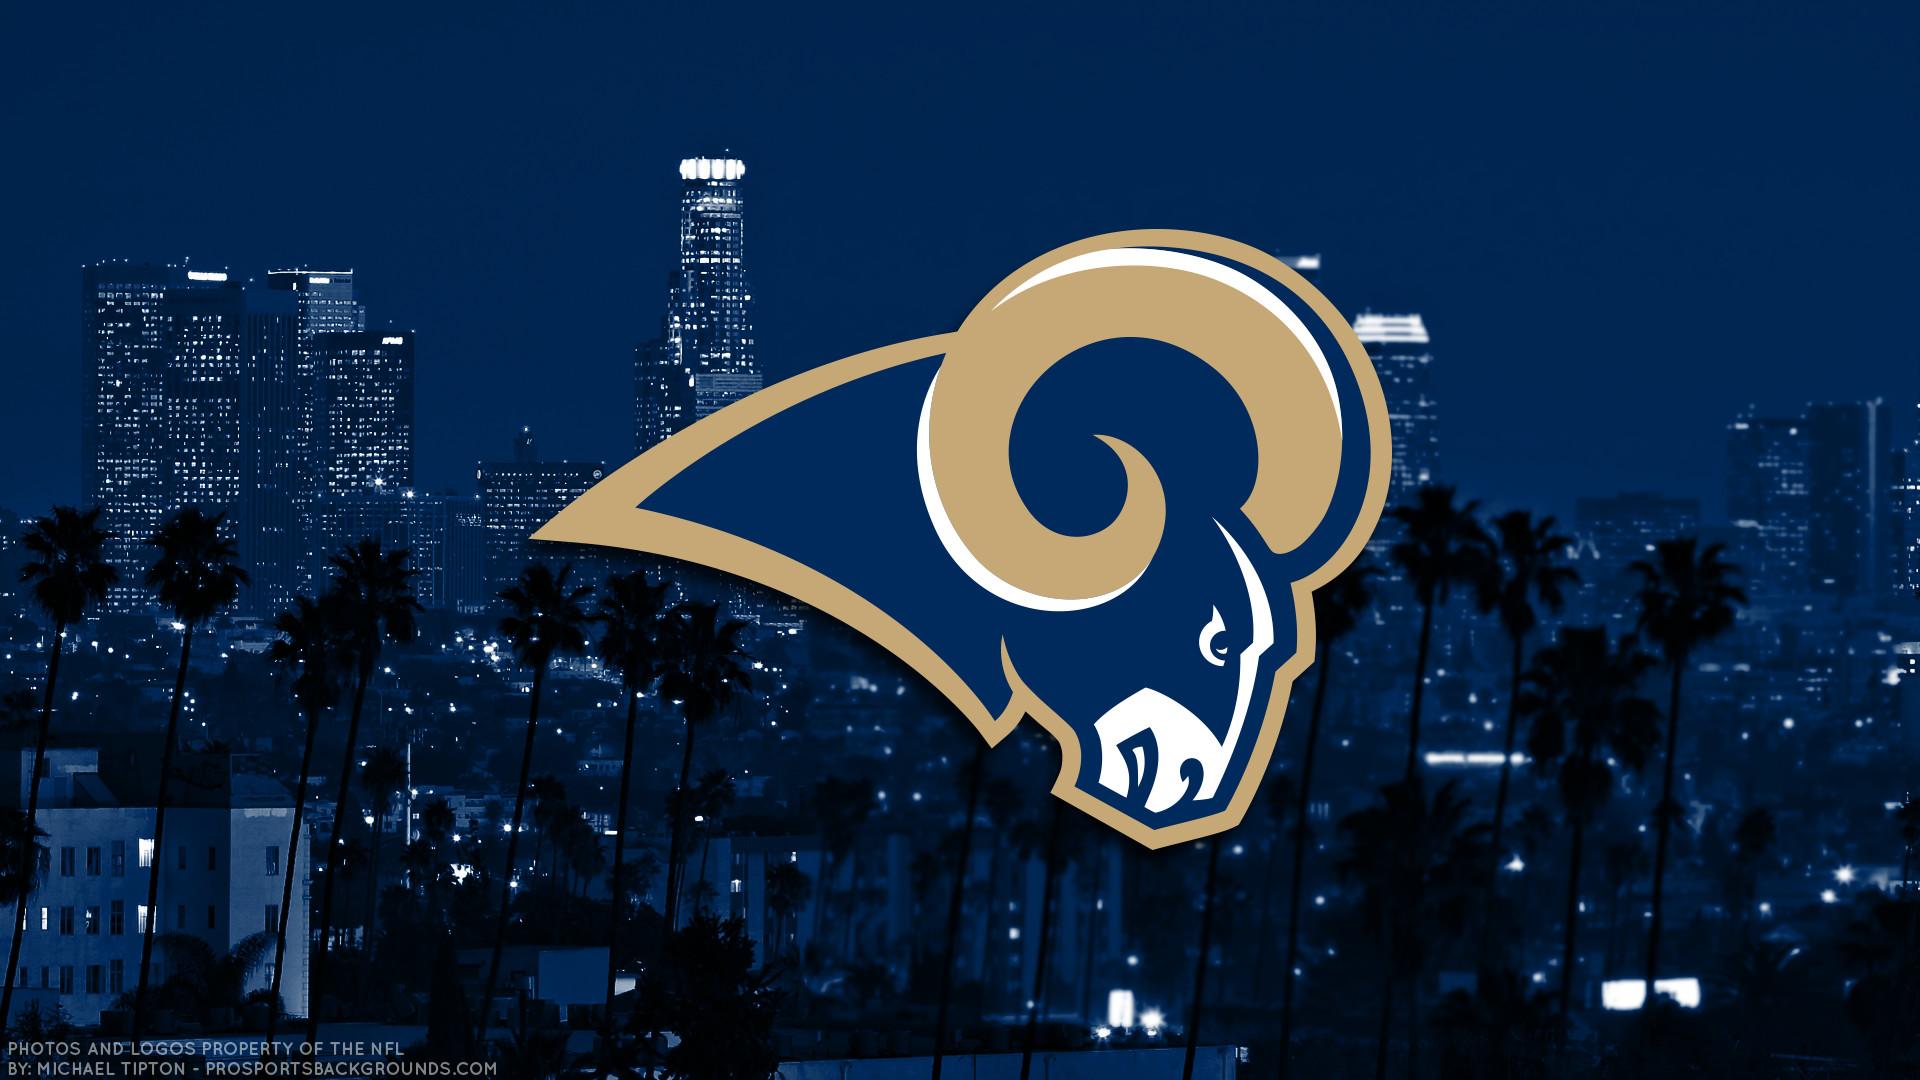 Los Angeles Rams 2017 Hd 4K Schedule Wallpaper intended for Los Angeles  Rams Wallpaper